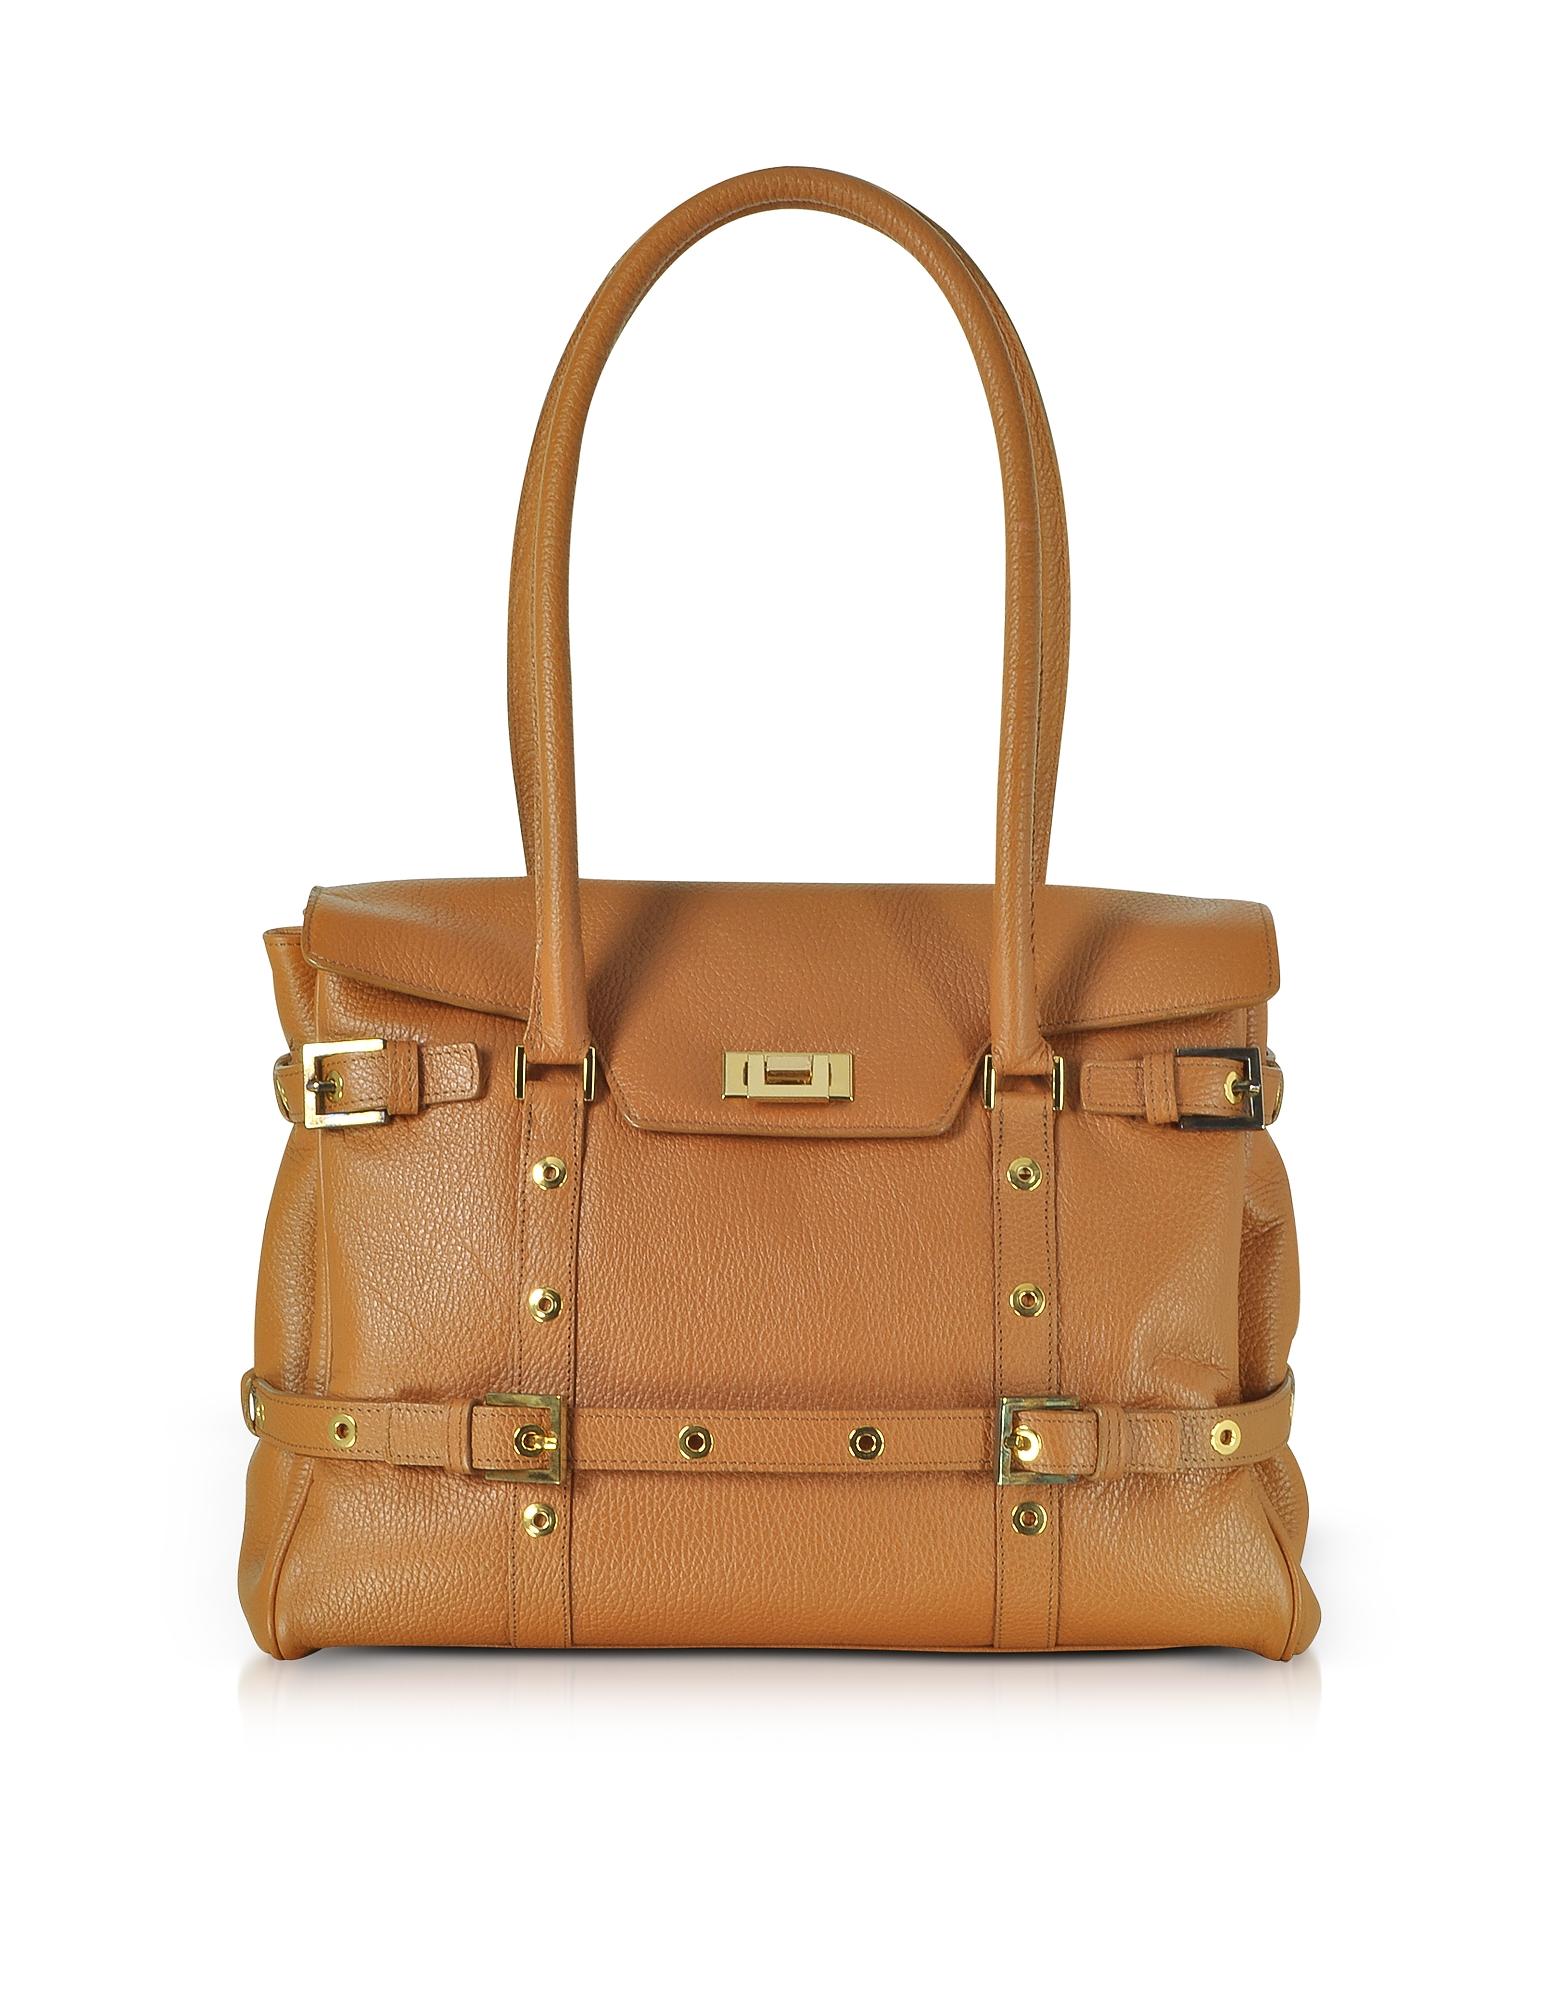 Fontanelli Handbags, Camel Buckled Calf Leather Satchel Bag